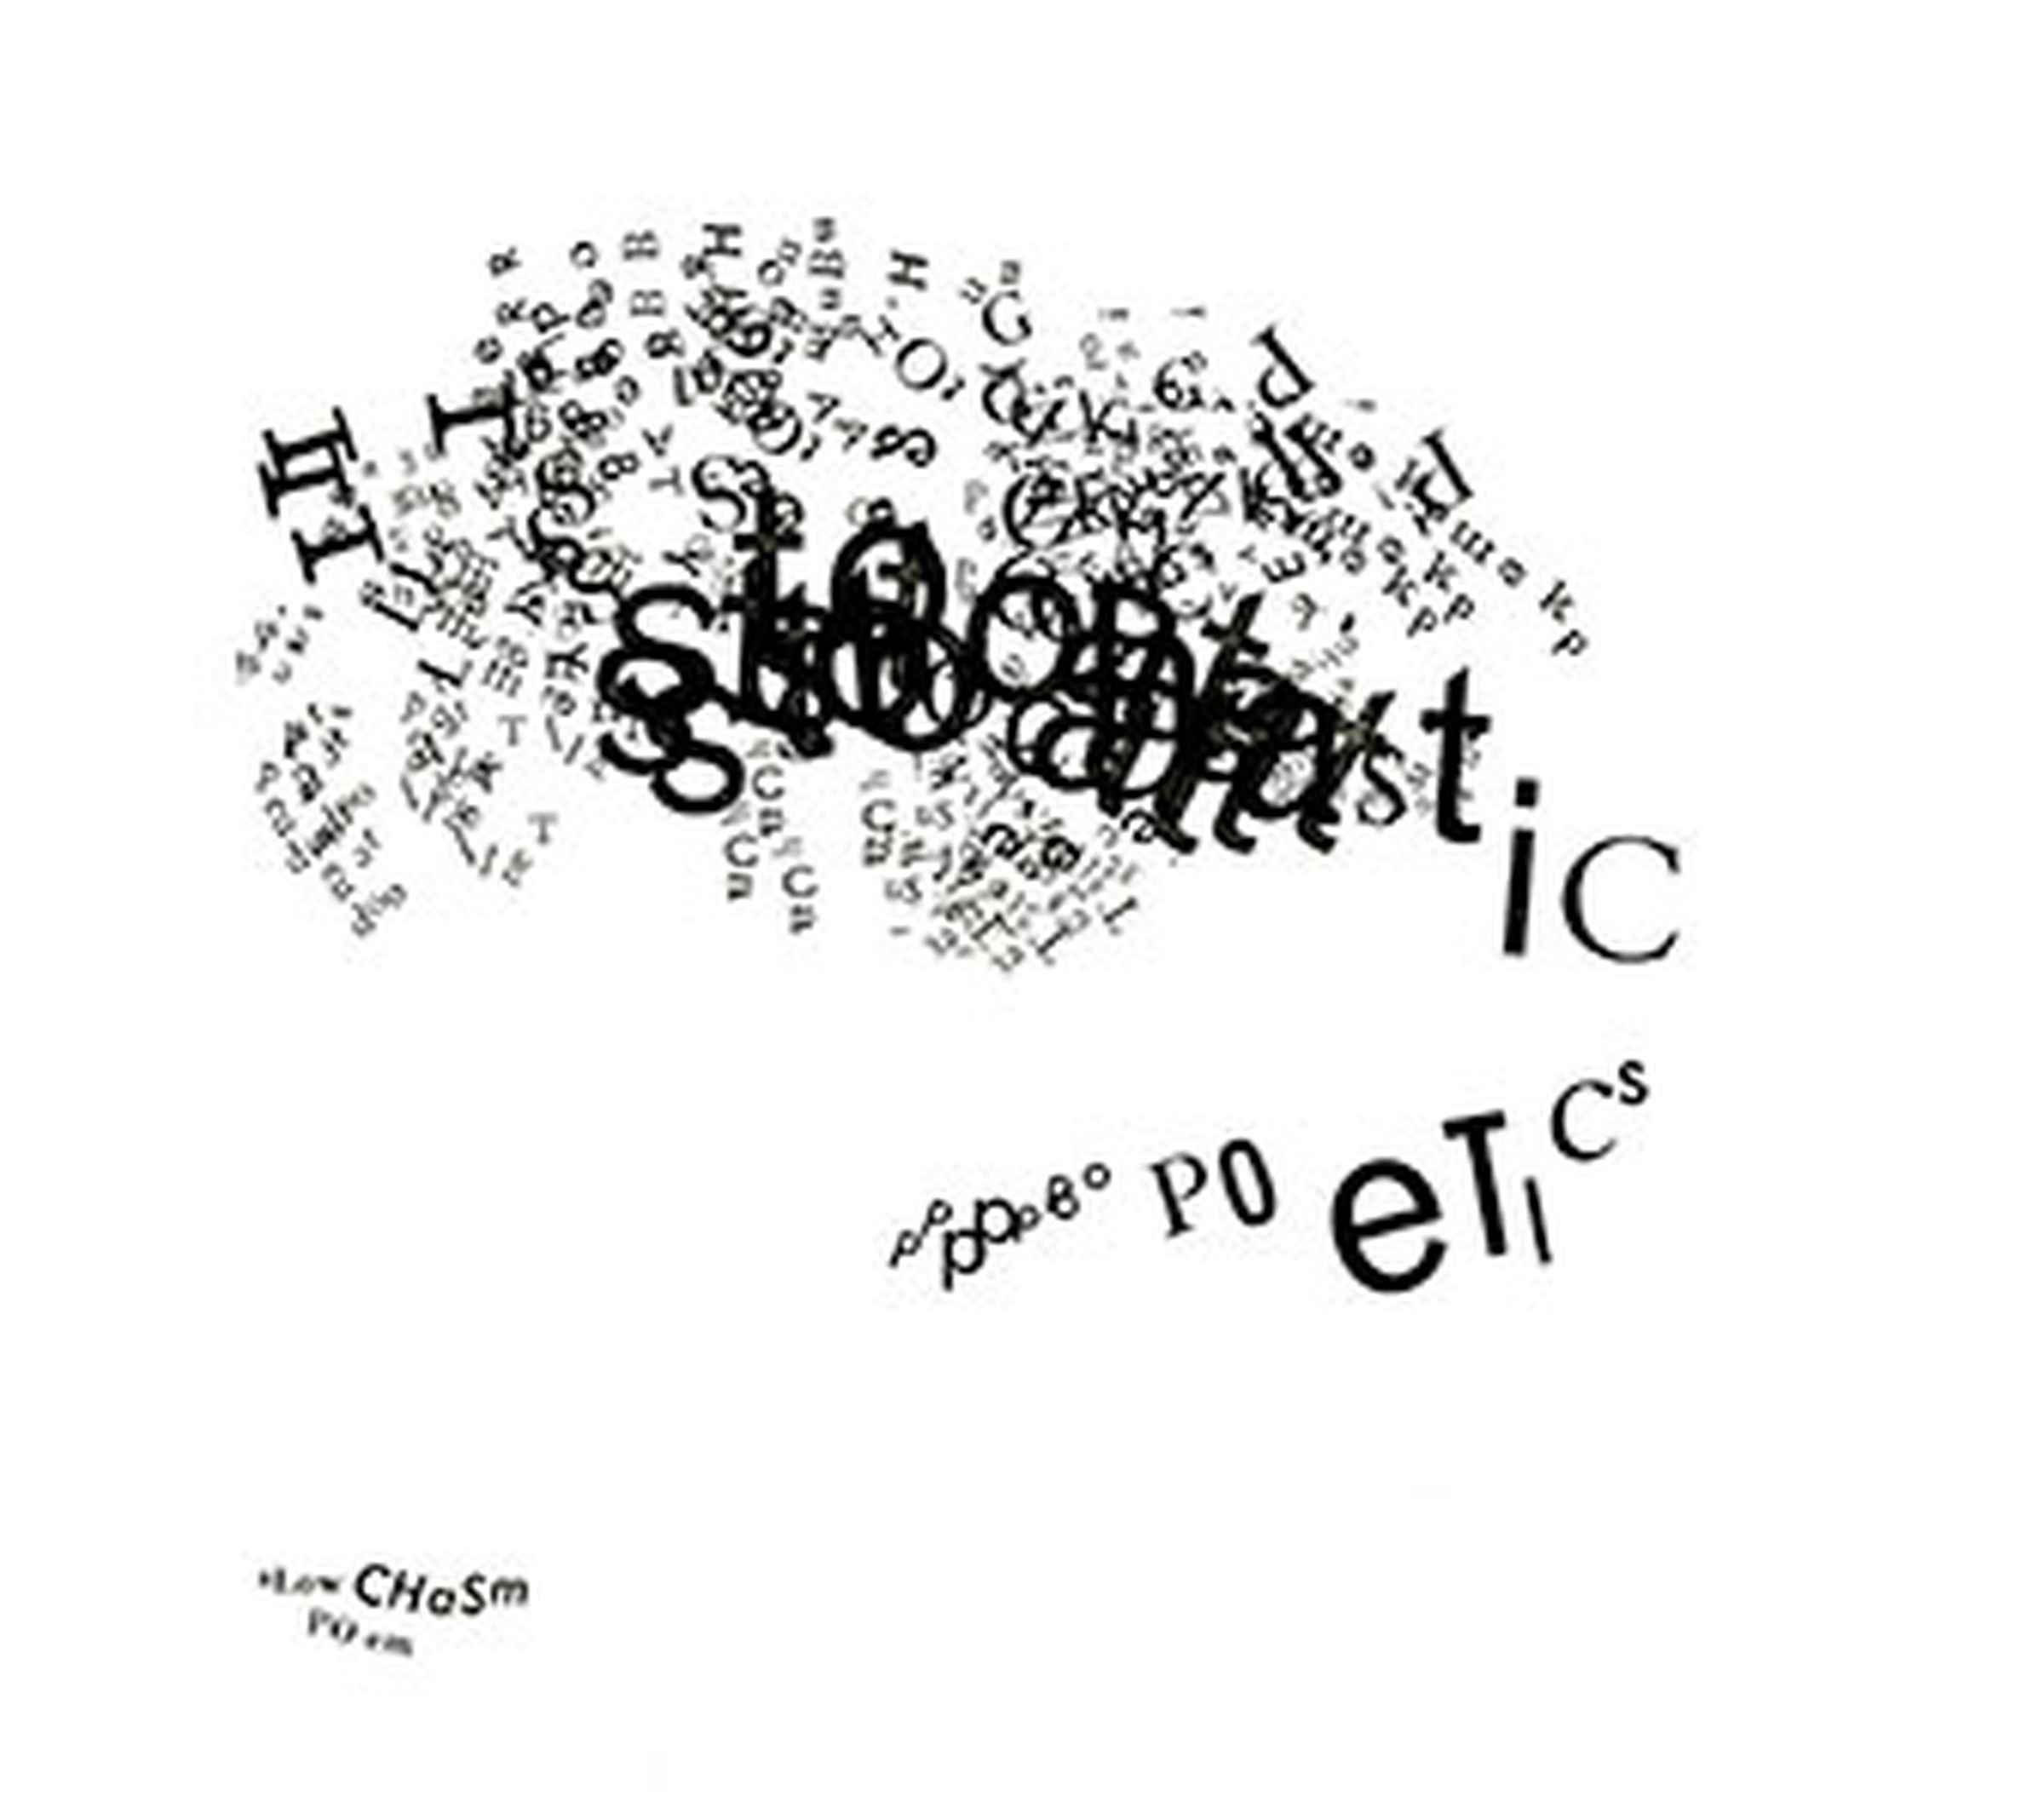 Stochastic Poetics by Johanna Drucker.